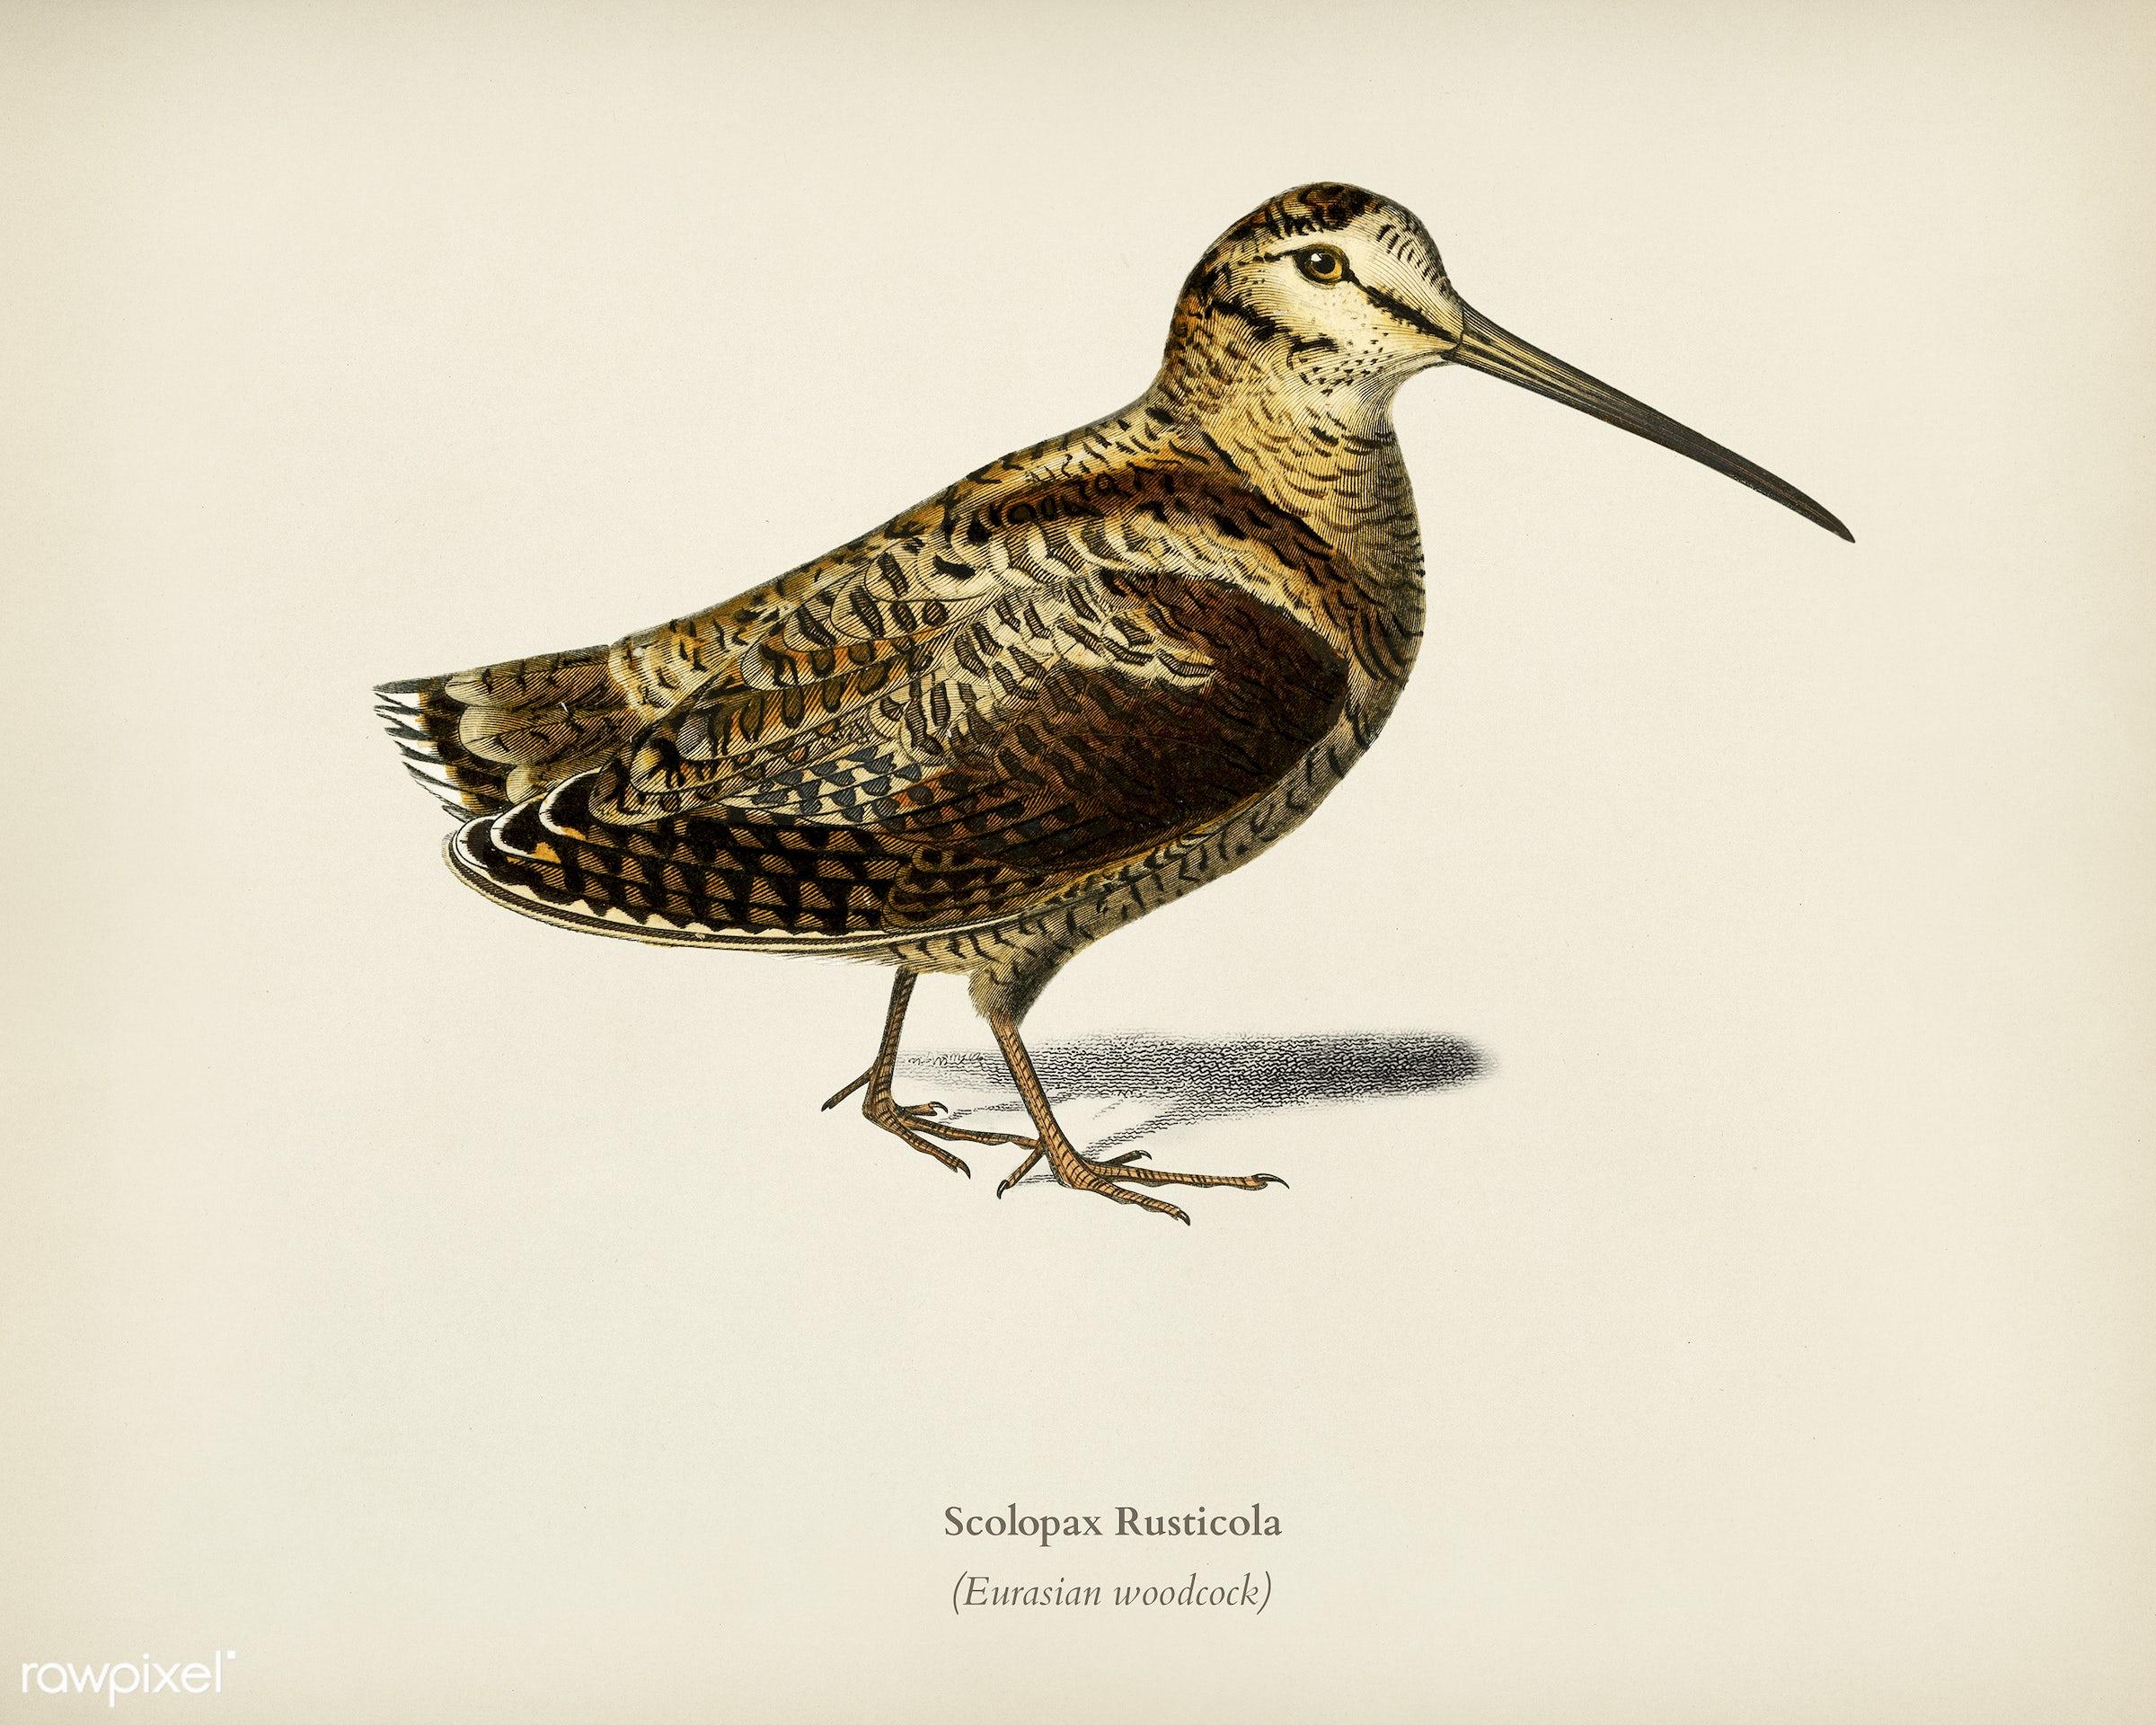 Eurasian Woodcock (Scolopax Rusticola) illustrated by Charles Dessalines D' Orbigny (1806-1876). Digitally enhanced from...